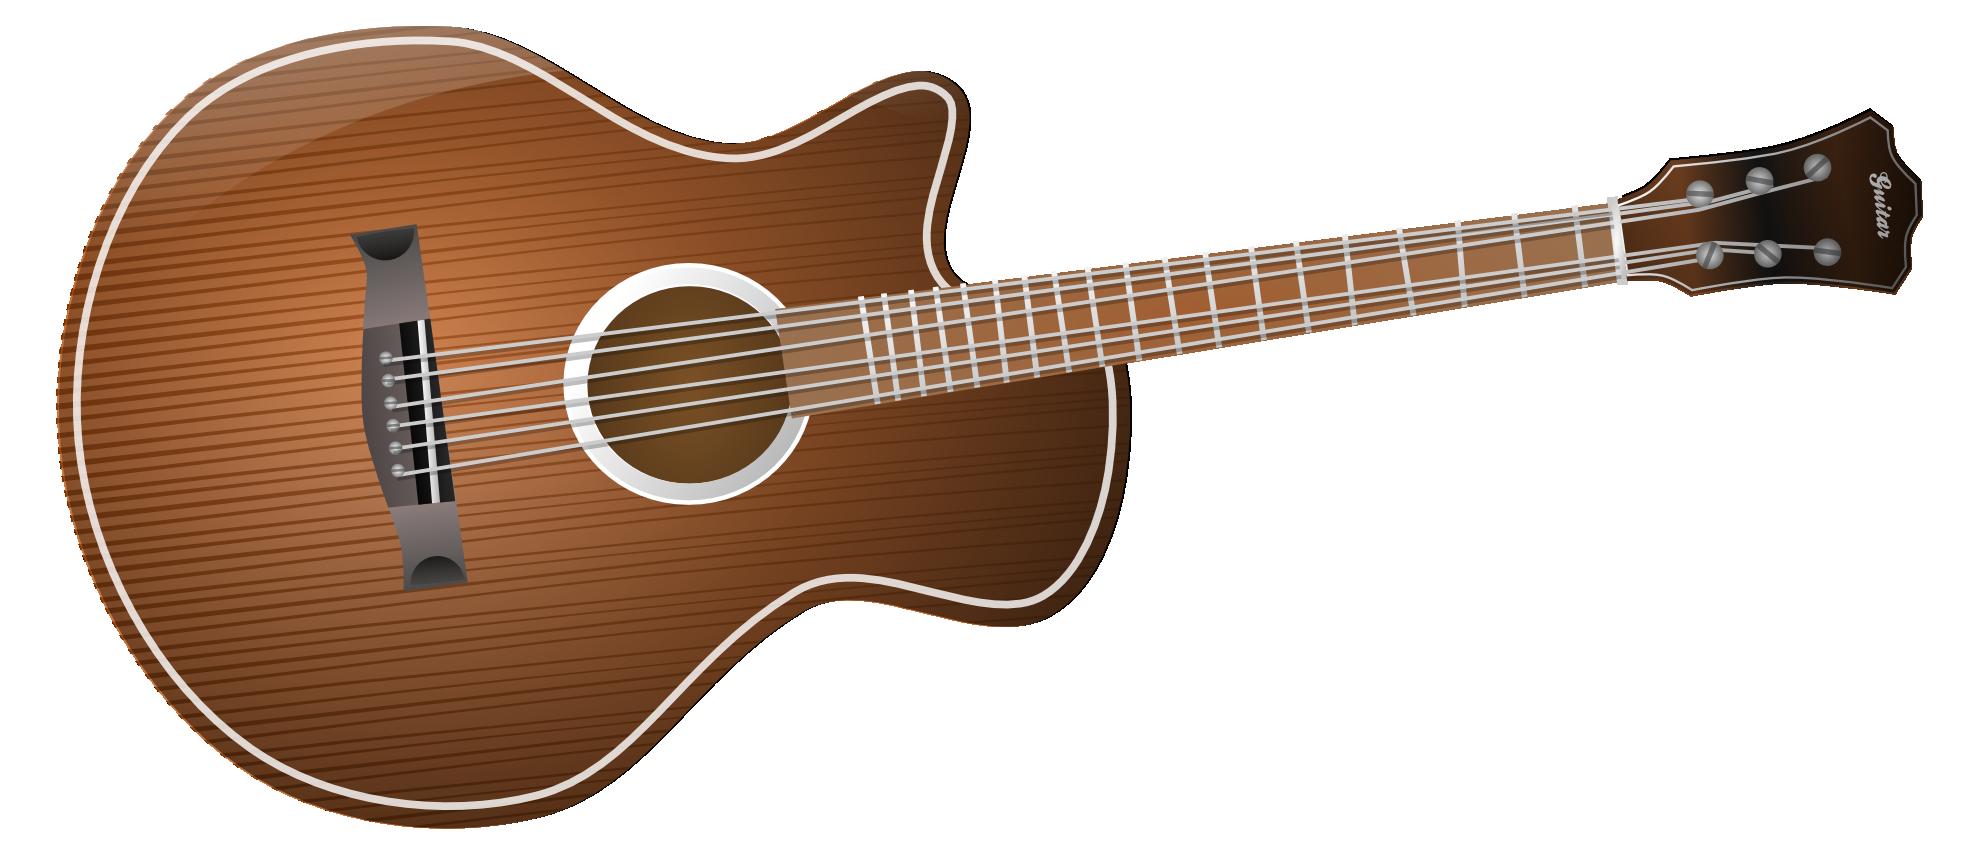 Acoustic Classic Guitar Png Image Guitar Classic Guitar Guitar Photos